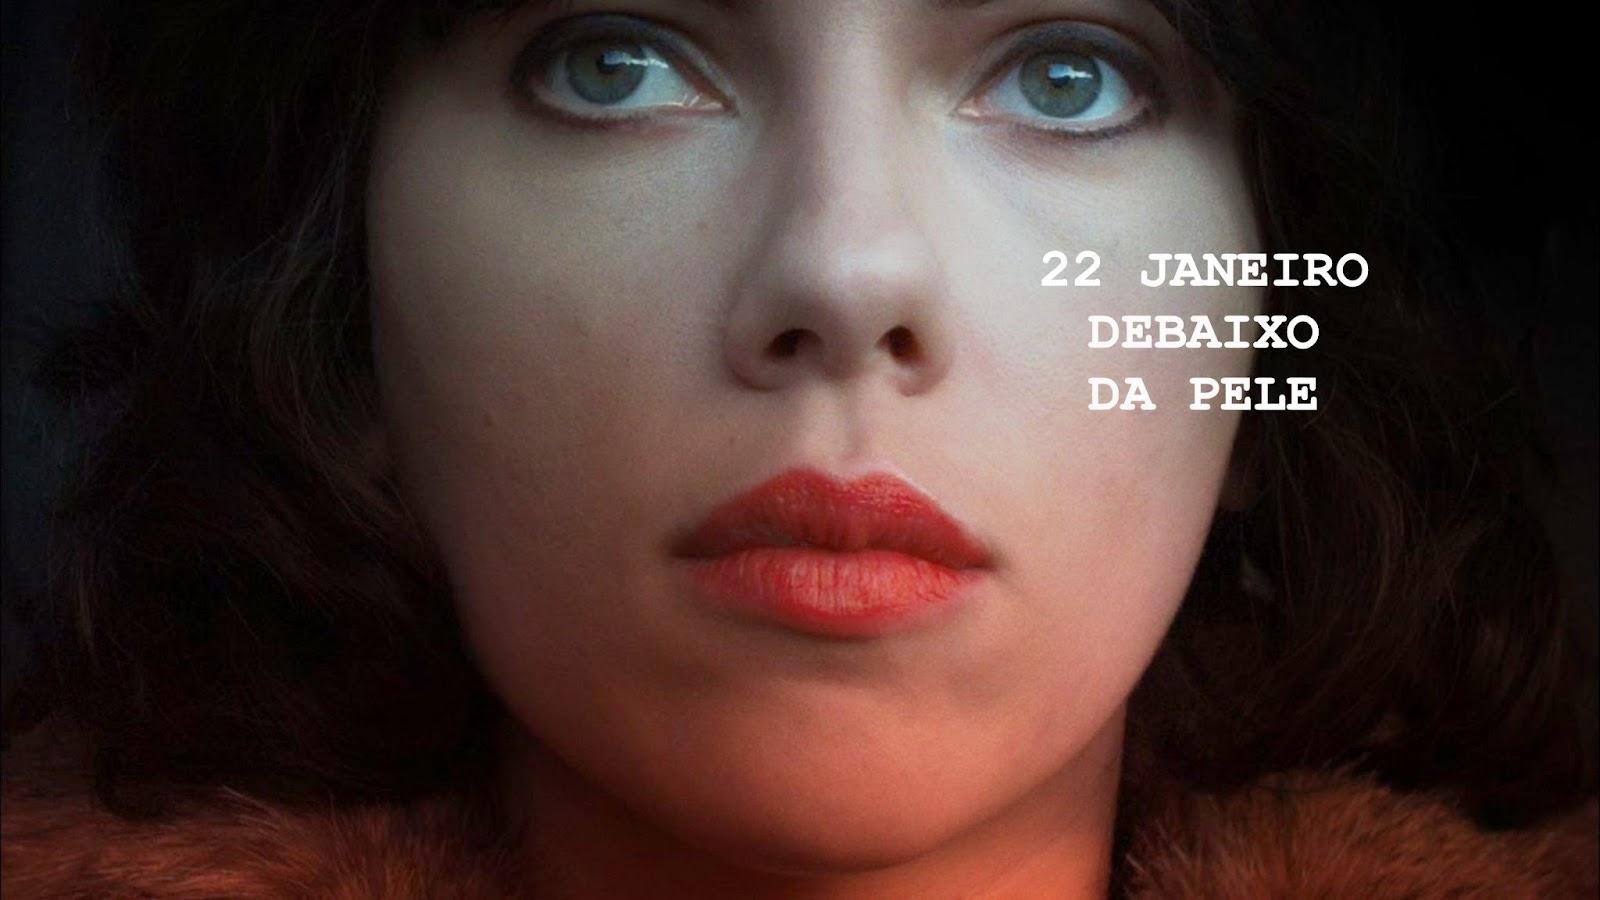 Debaixo da Pele - Under the Skin (2013)